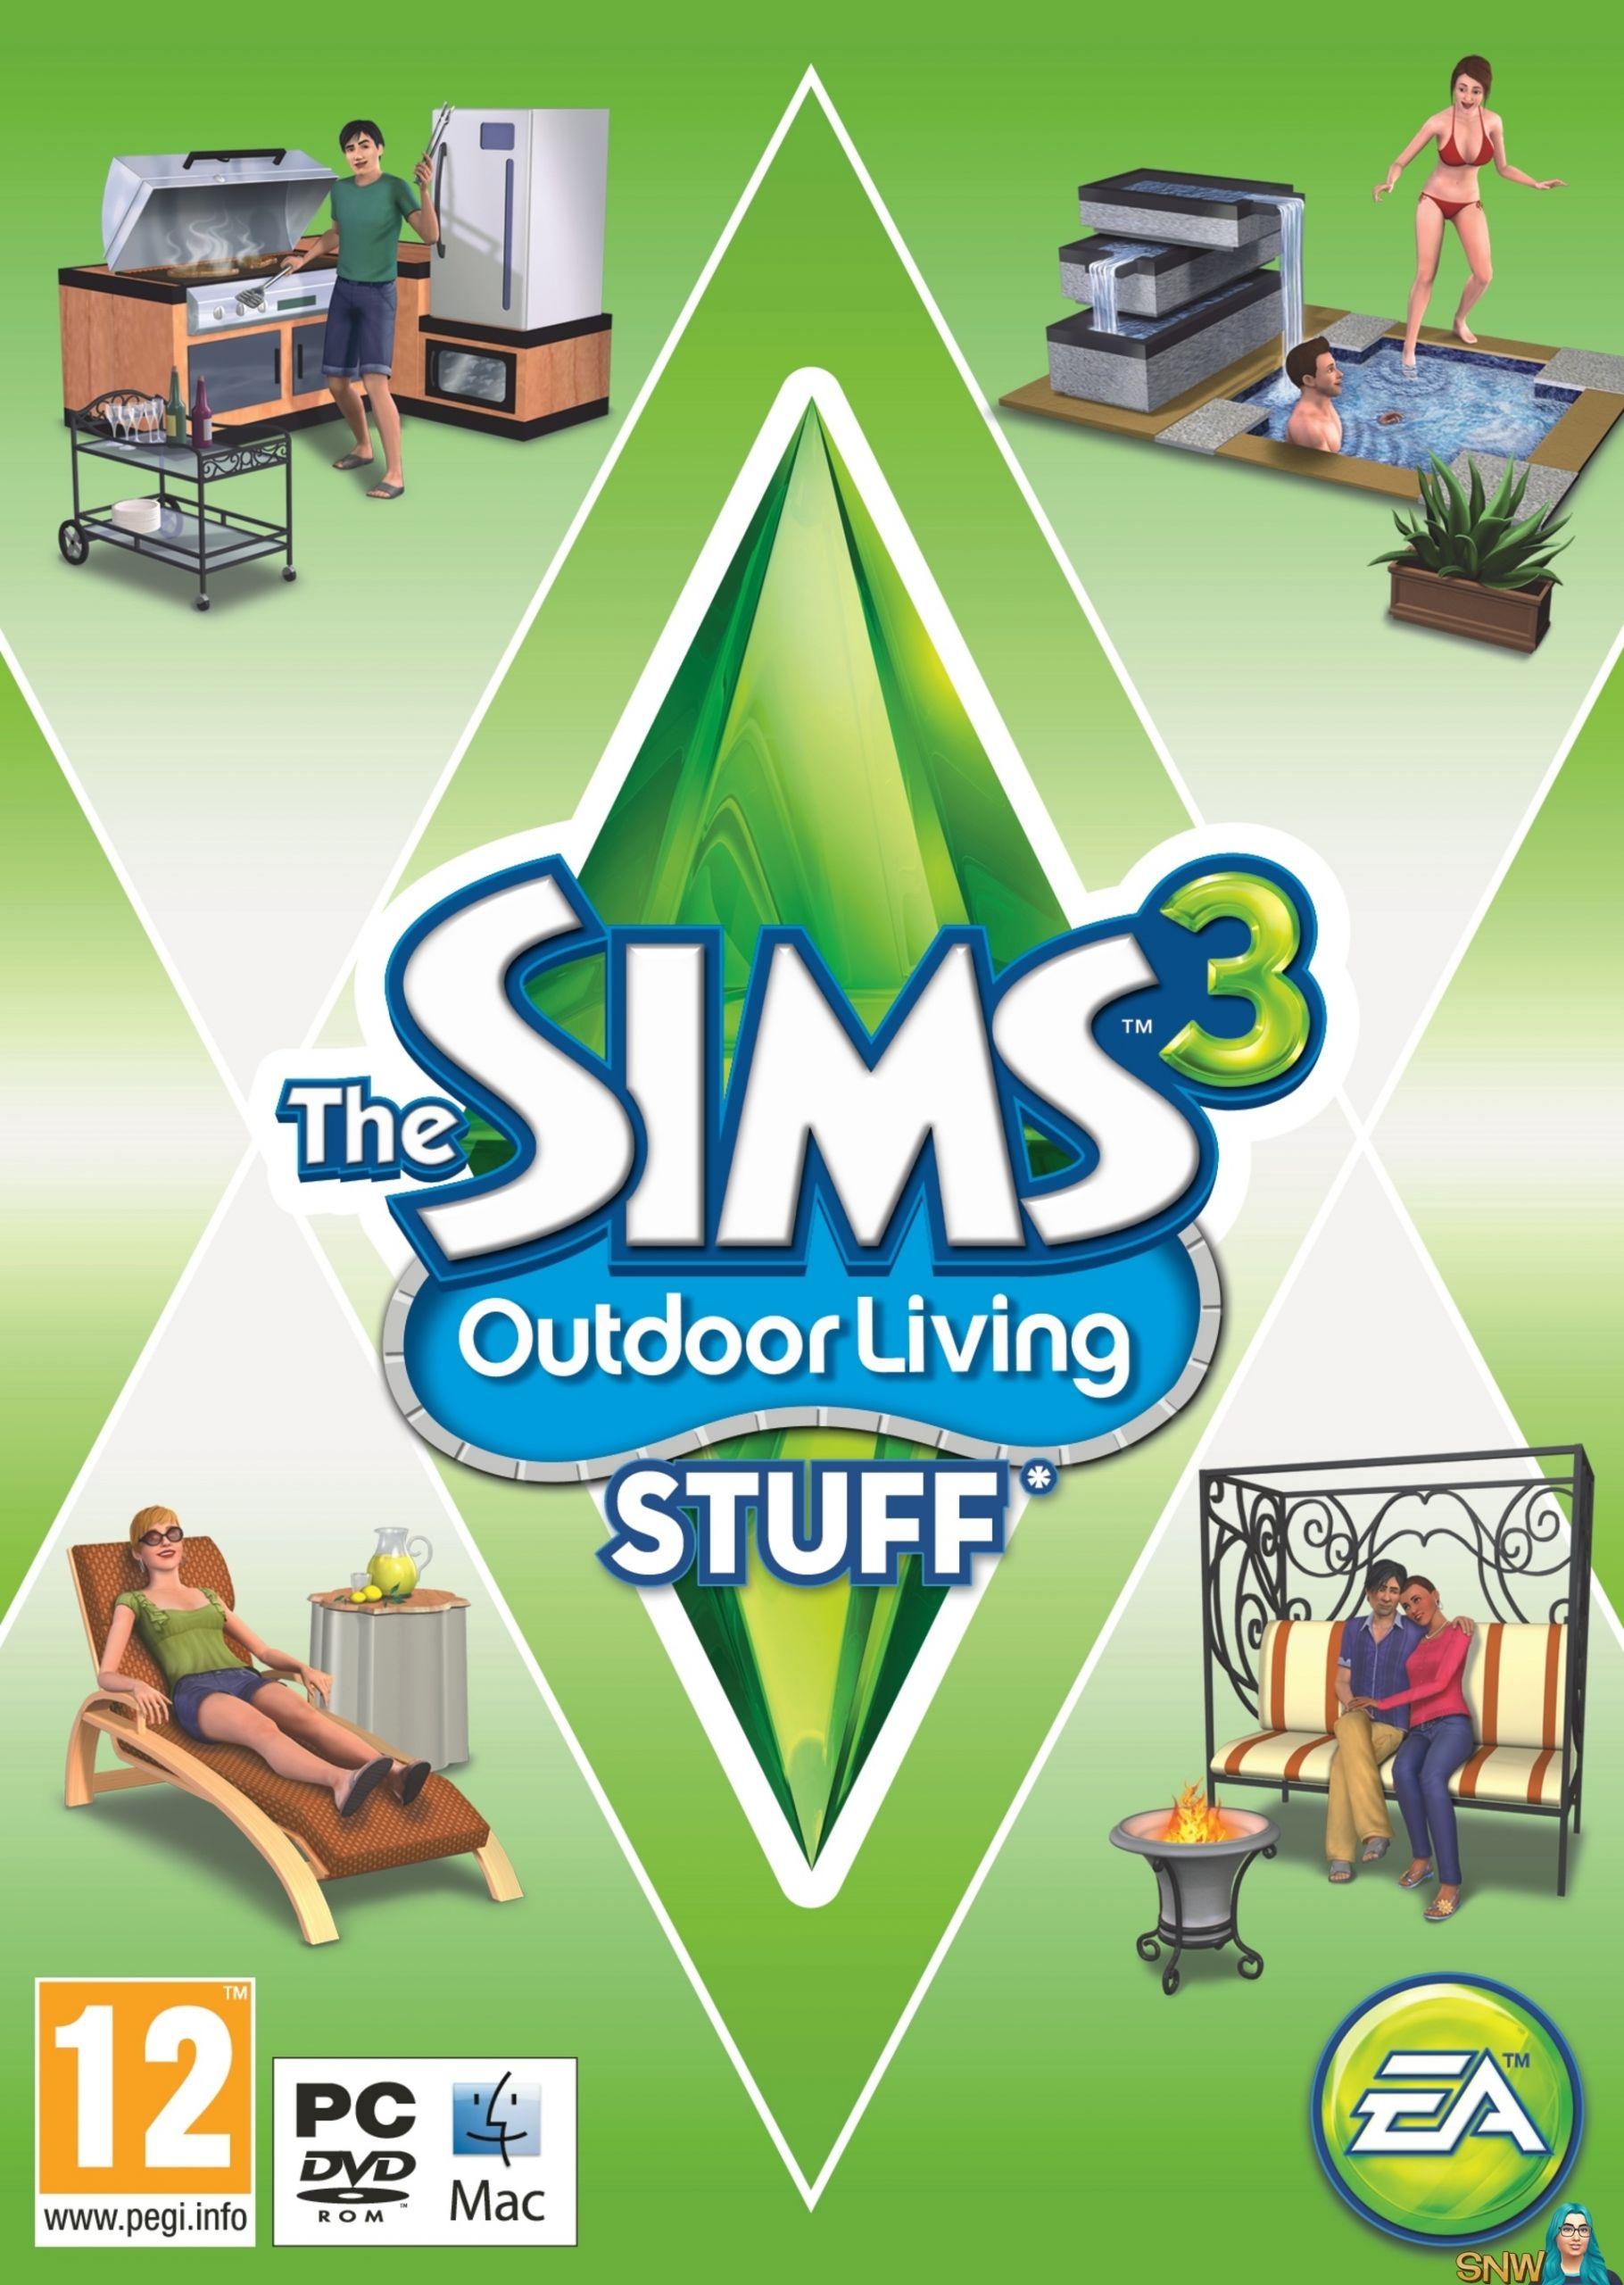 Sims 3 Design Garten Accessoires Genial Buy the Sims 3 Outdoor Living Stuff Ficial Website